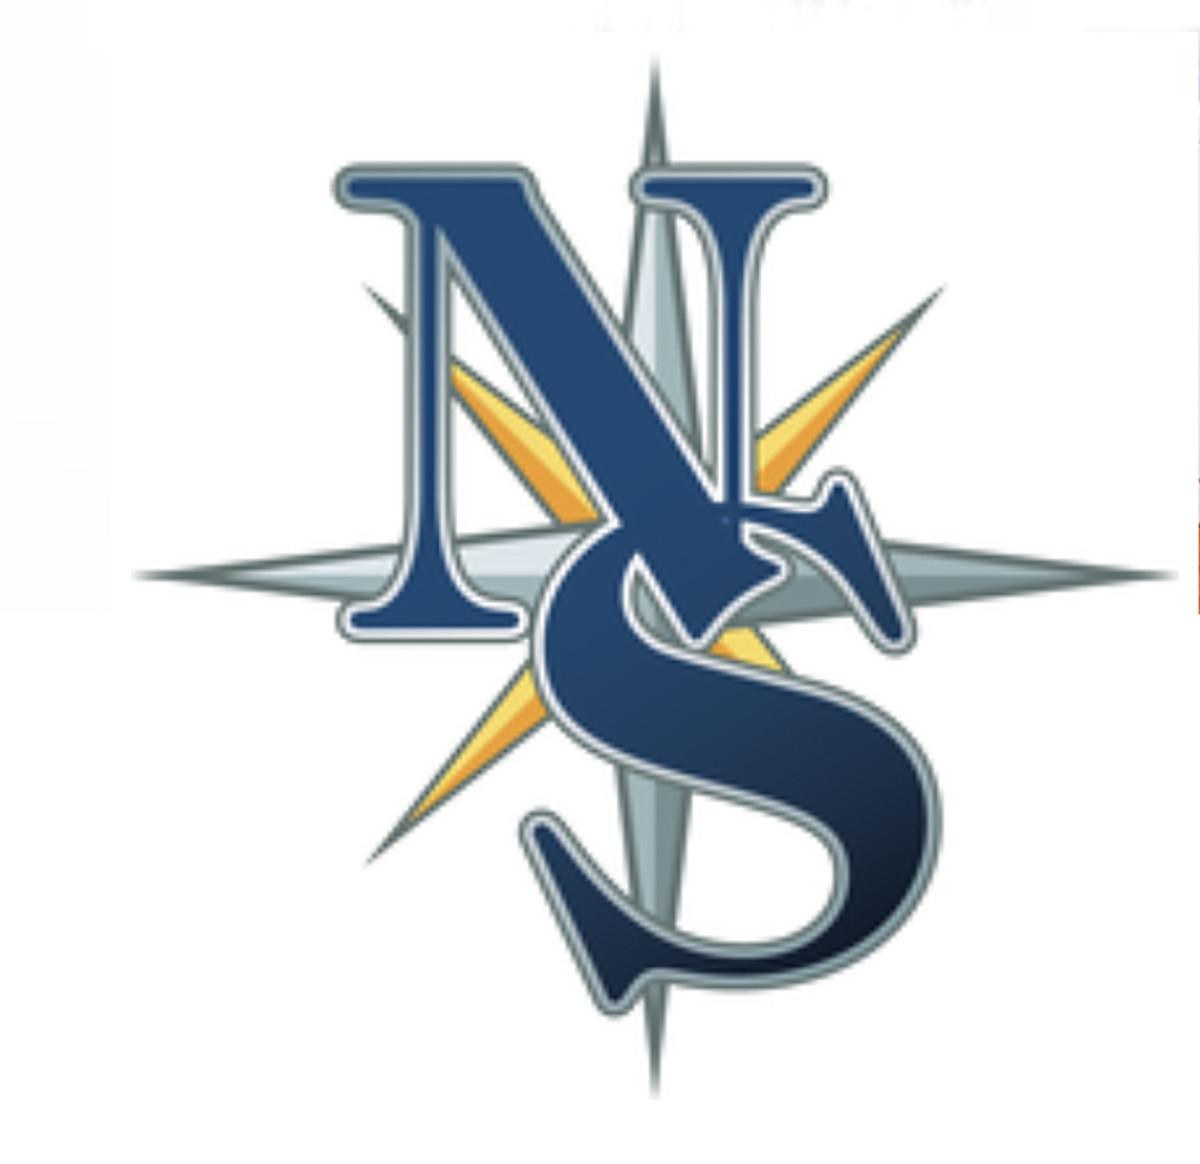 2_Nautical Structures logo